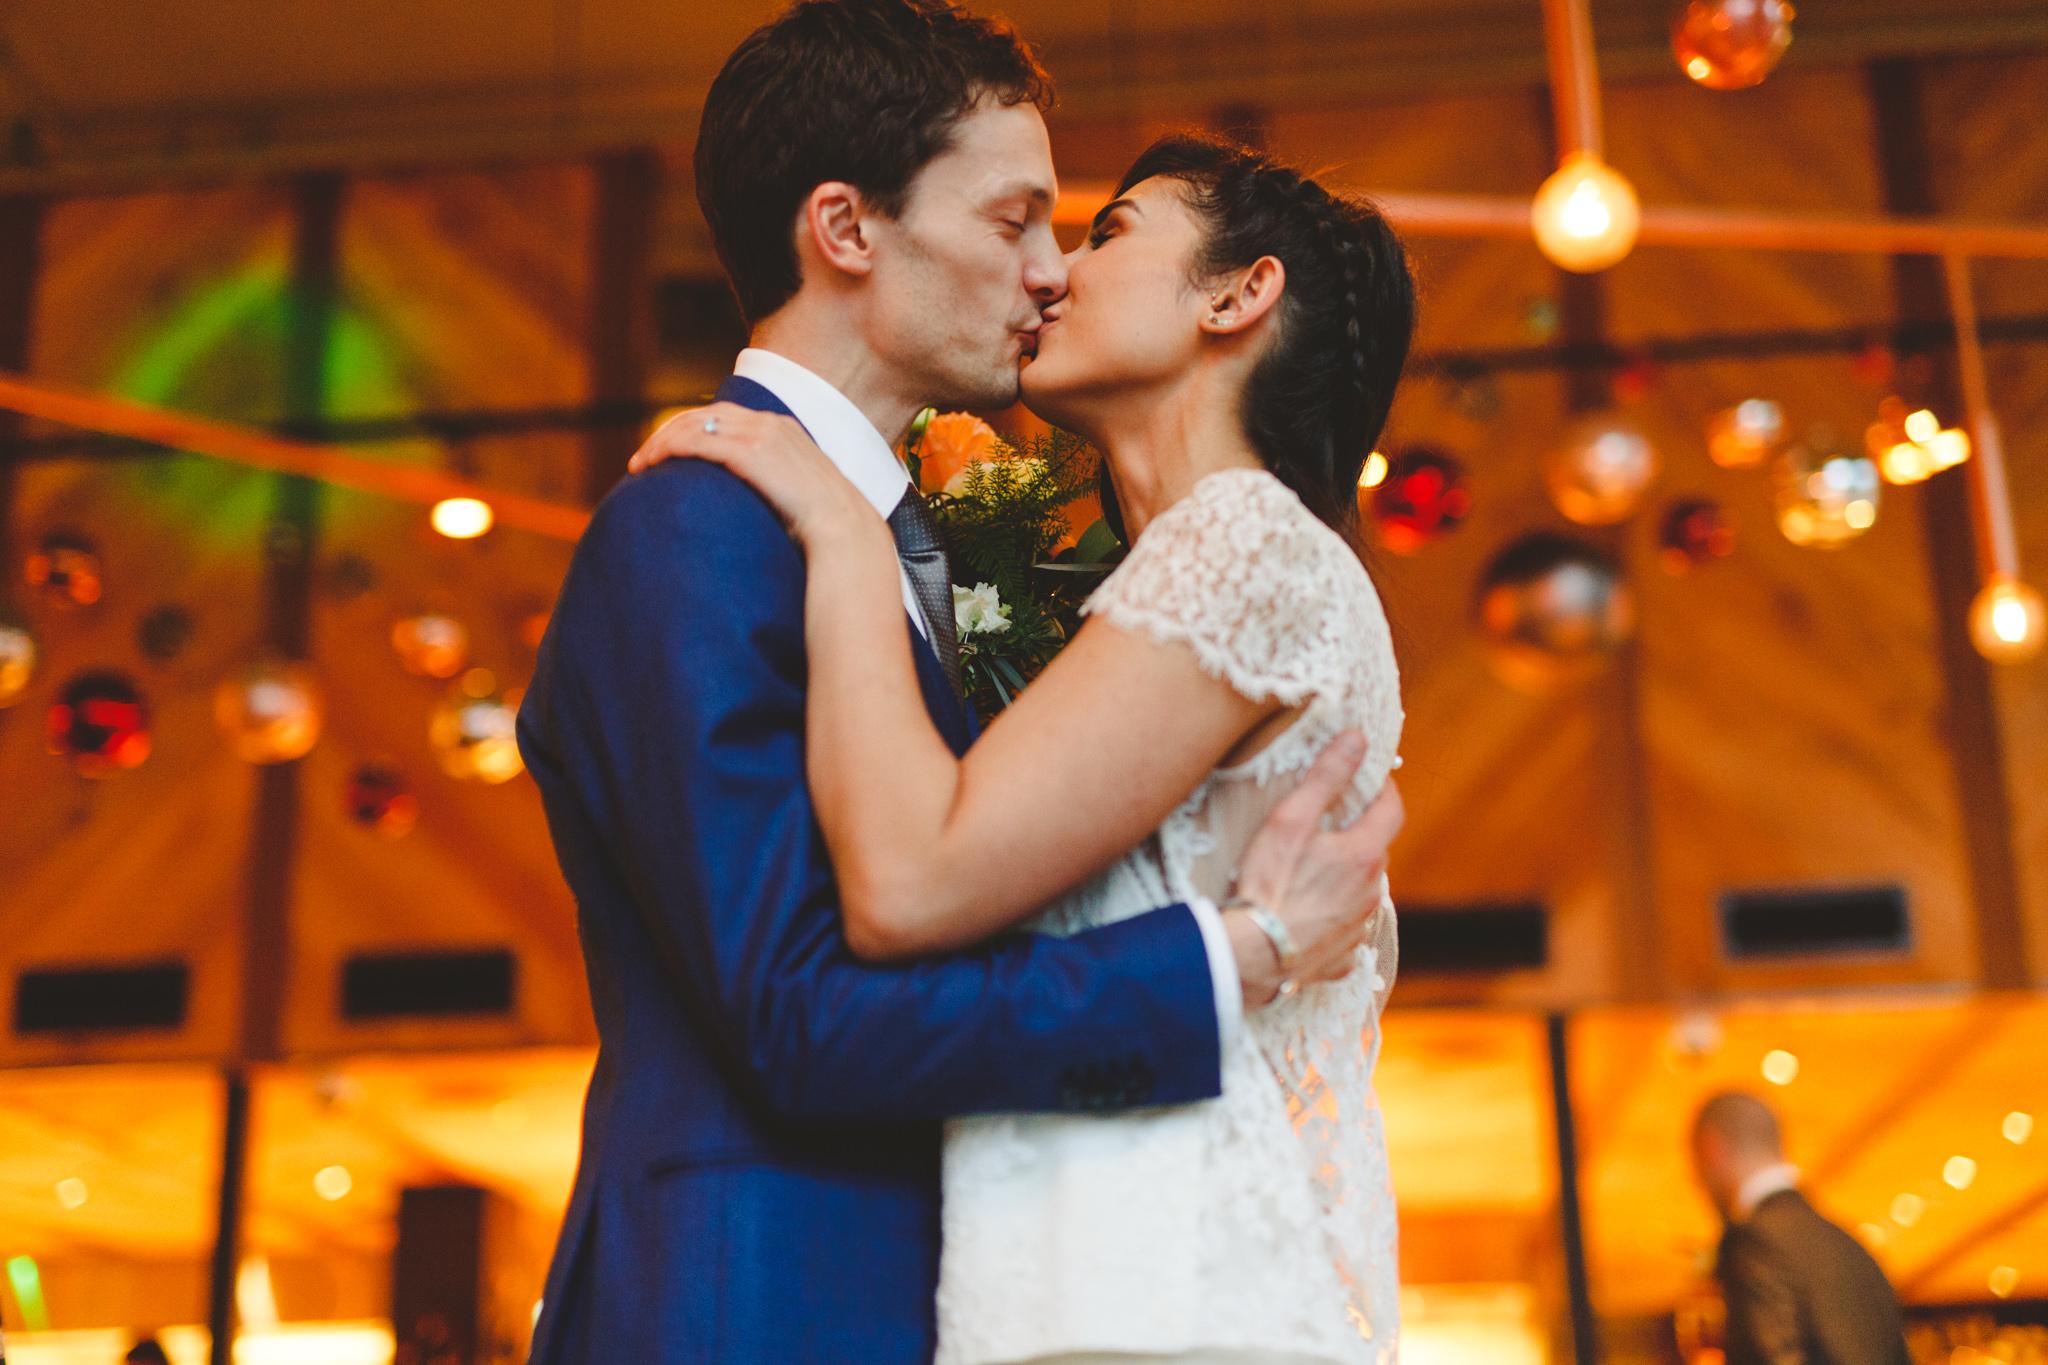 derbyshire-wedding-photographer-camera-hannah-8.jpg